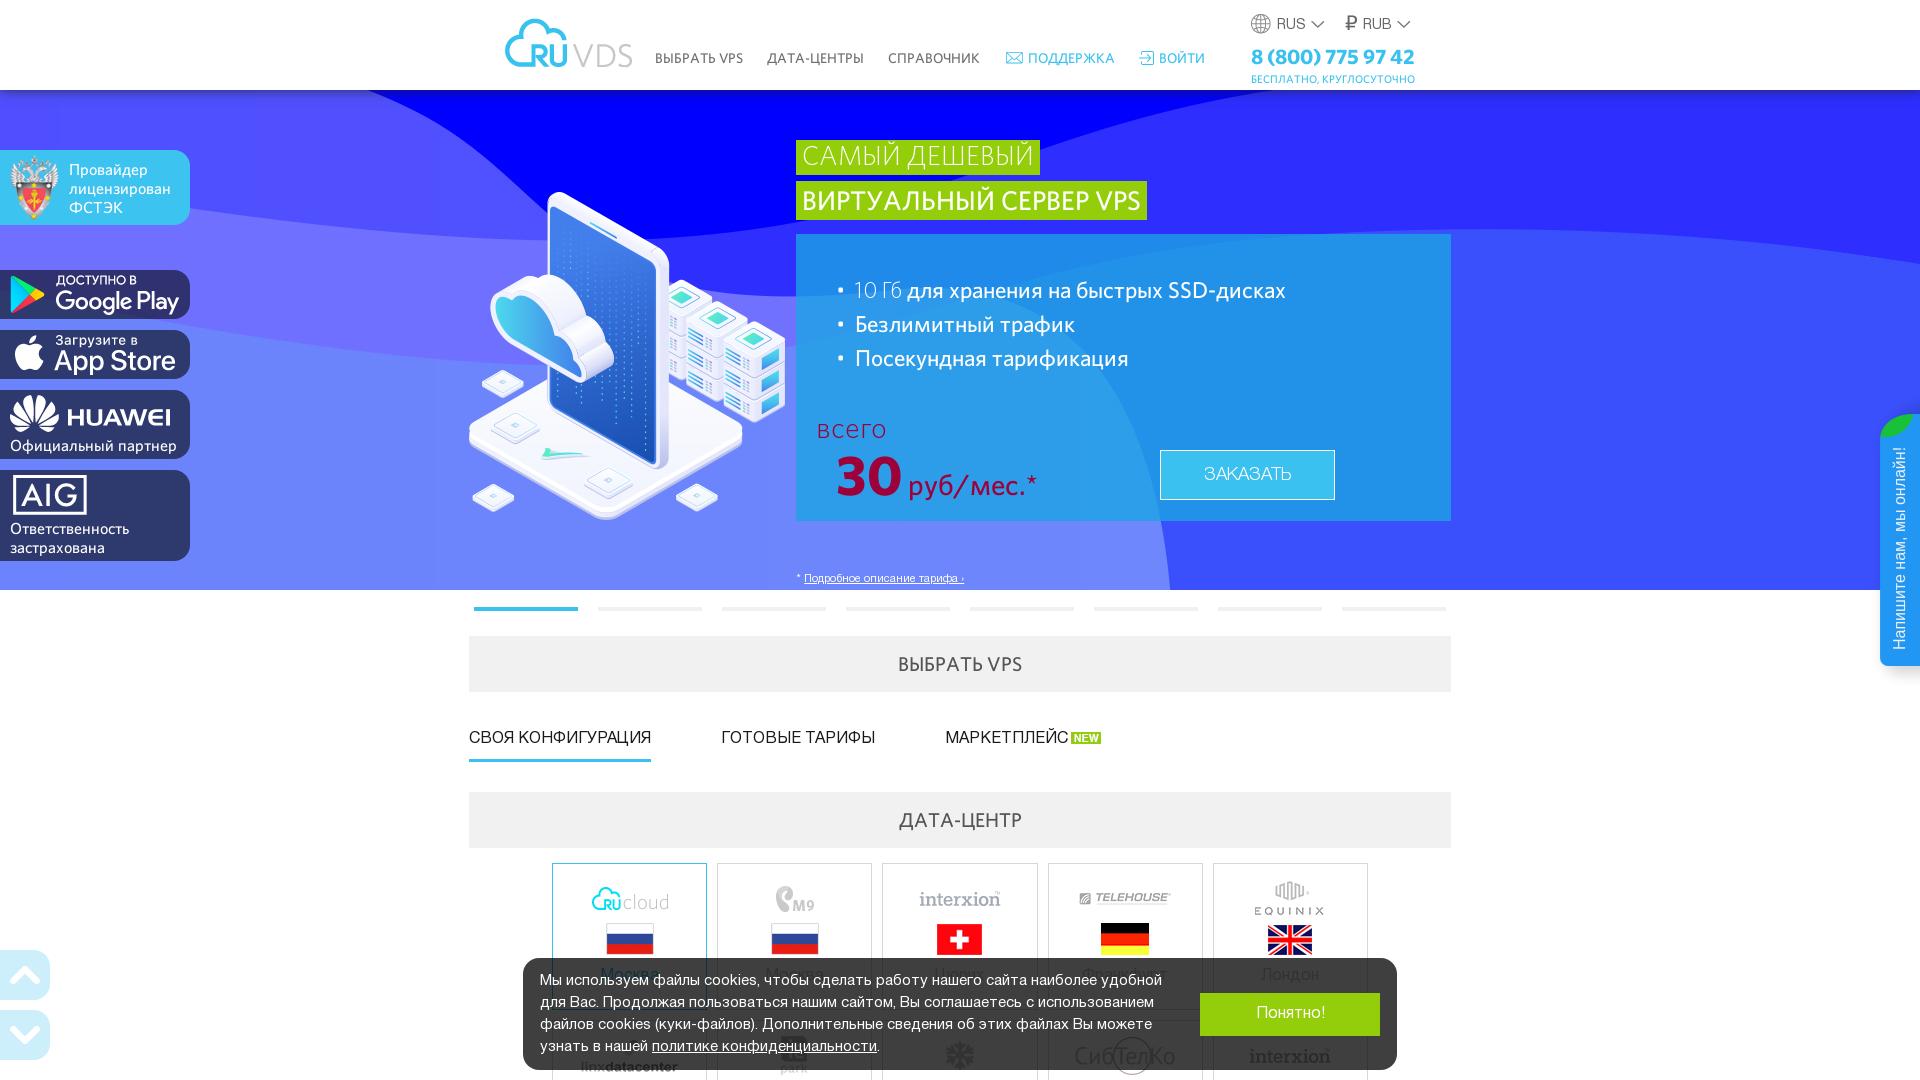 Ru vds WW website